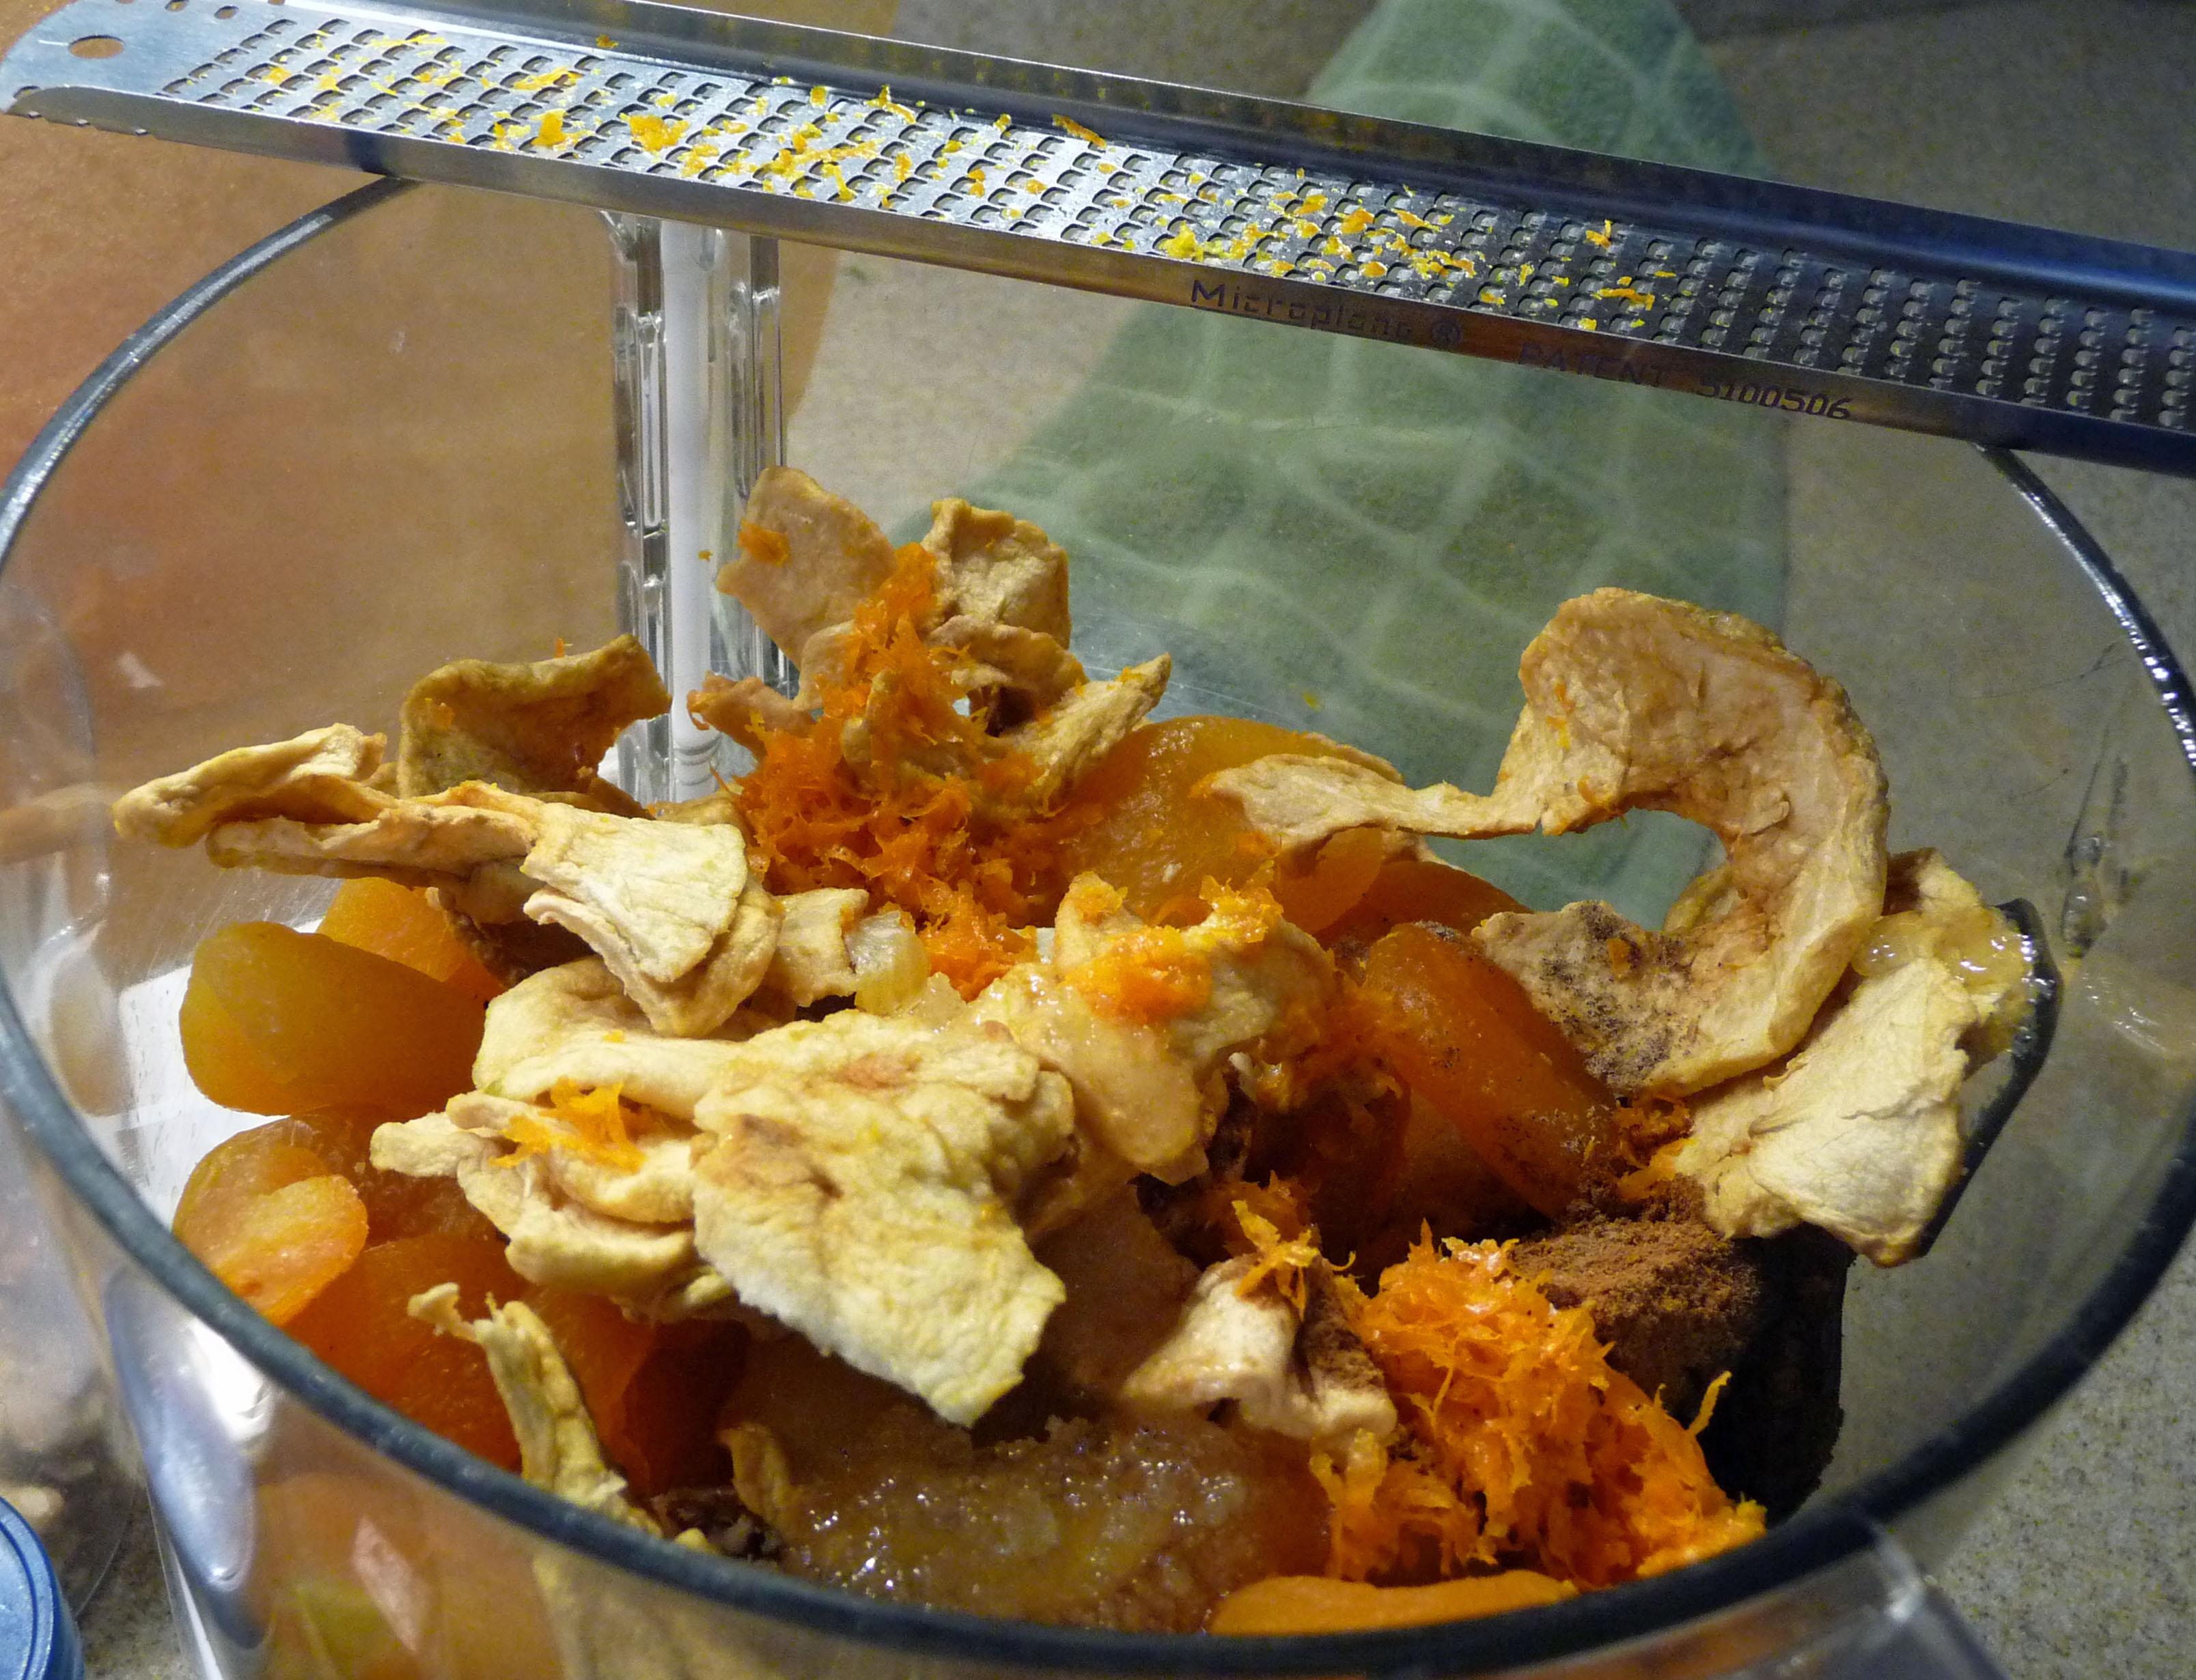 Dried fruit, honey, orange zest & spices in the food processor (c) jfhaugen